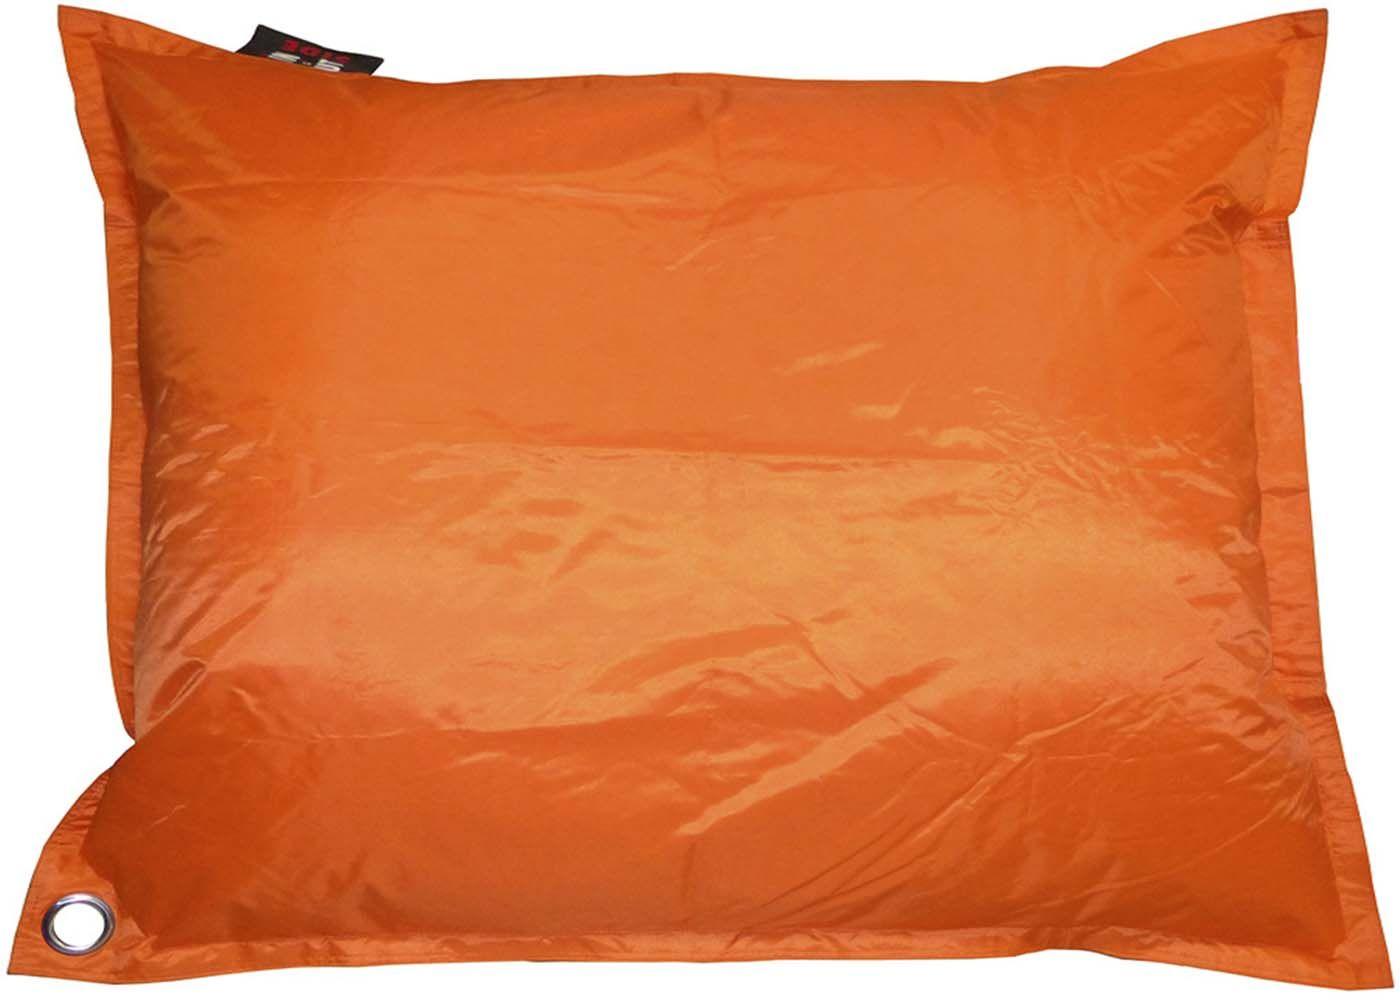 grand coussin uni maxi orange. Black Bedroom Furniture Sets. Home Design Ideas